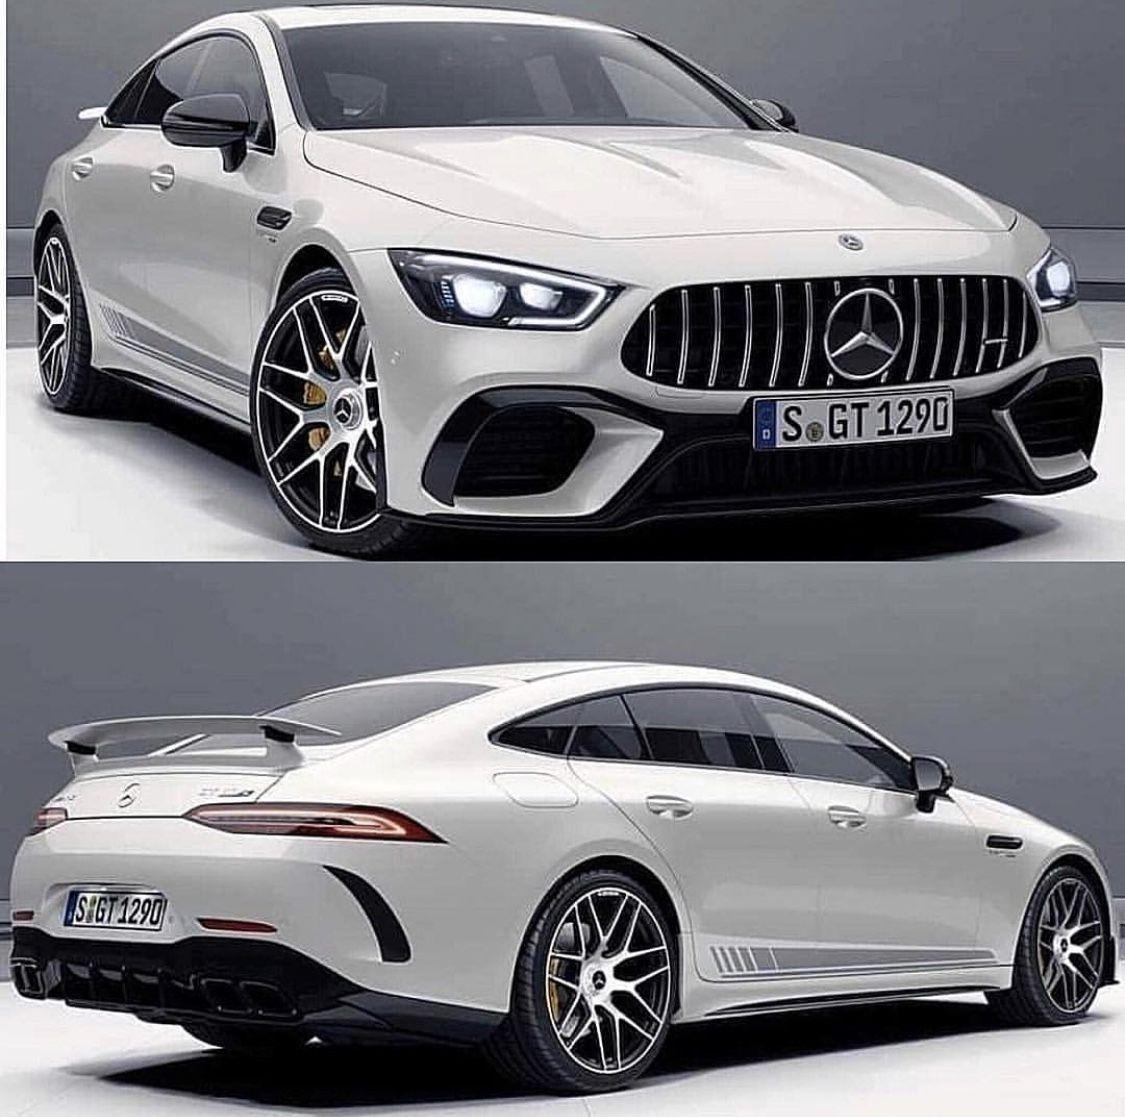 AMG GT63S | Mercedes amg, Mercedes benz amg, Mercedes car